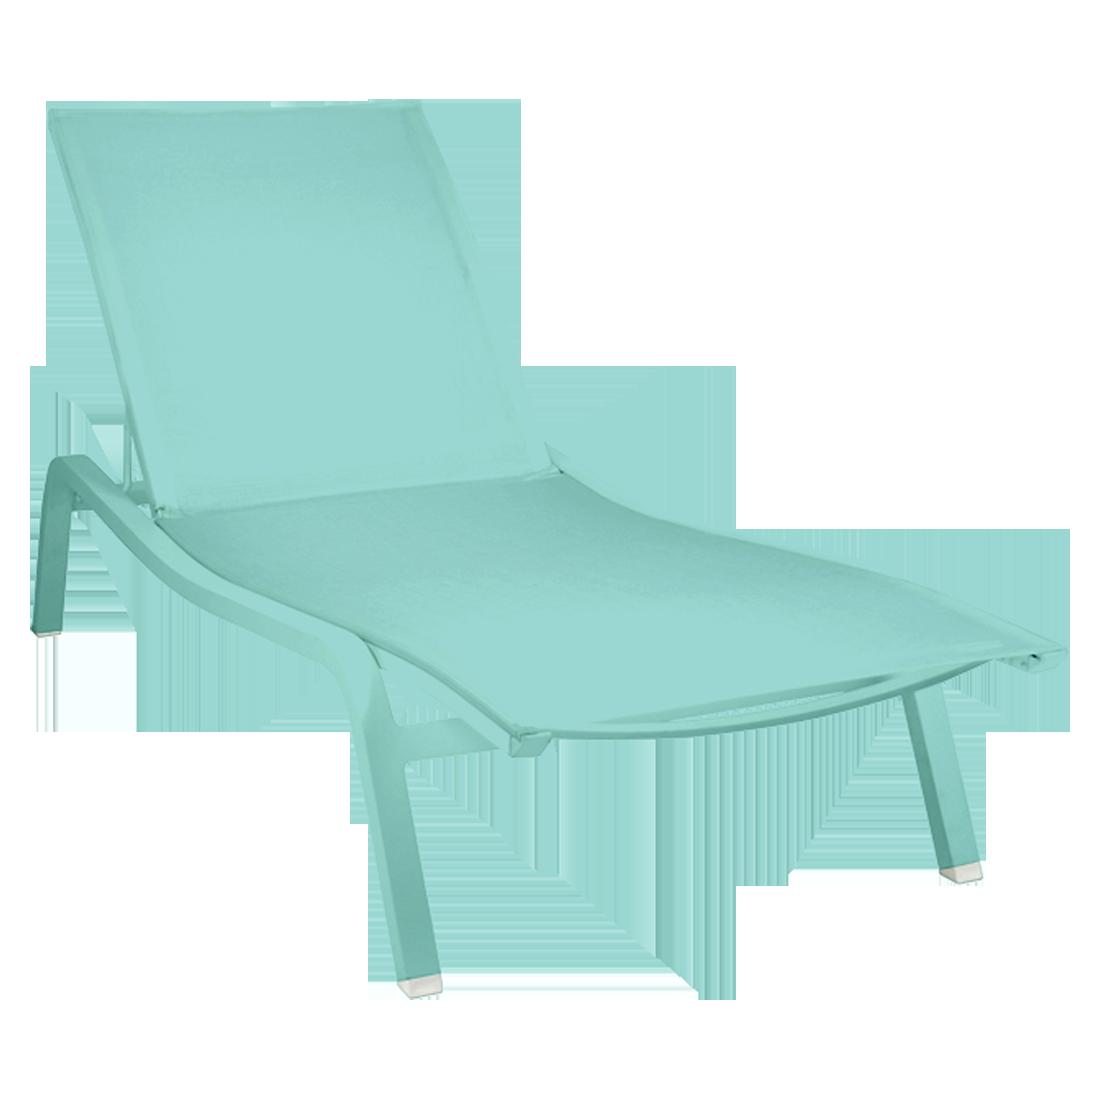 bain de soleil aliz xs de fermob bleu lagune. Black Bedroom Furniture Sets. Home Design Ideas